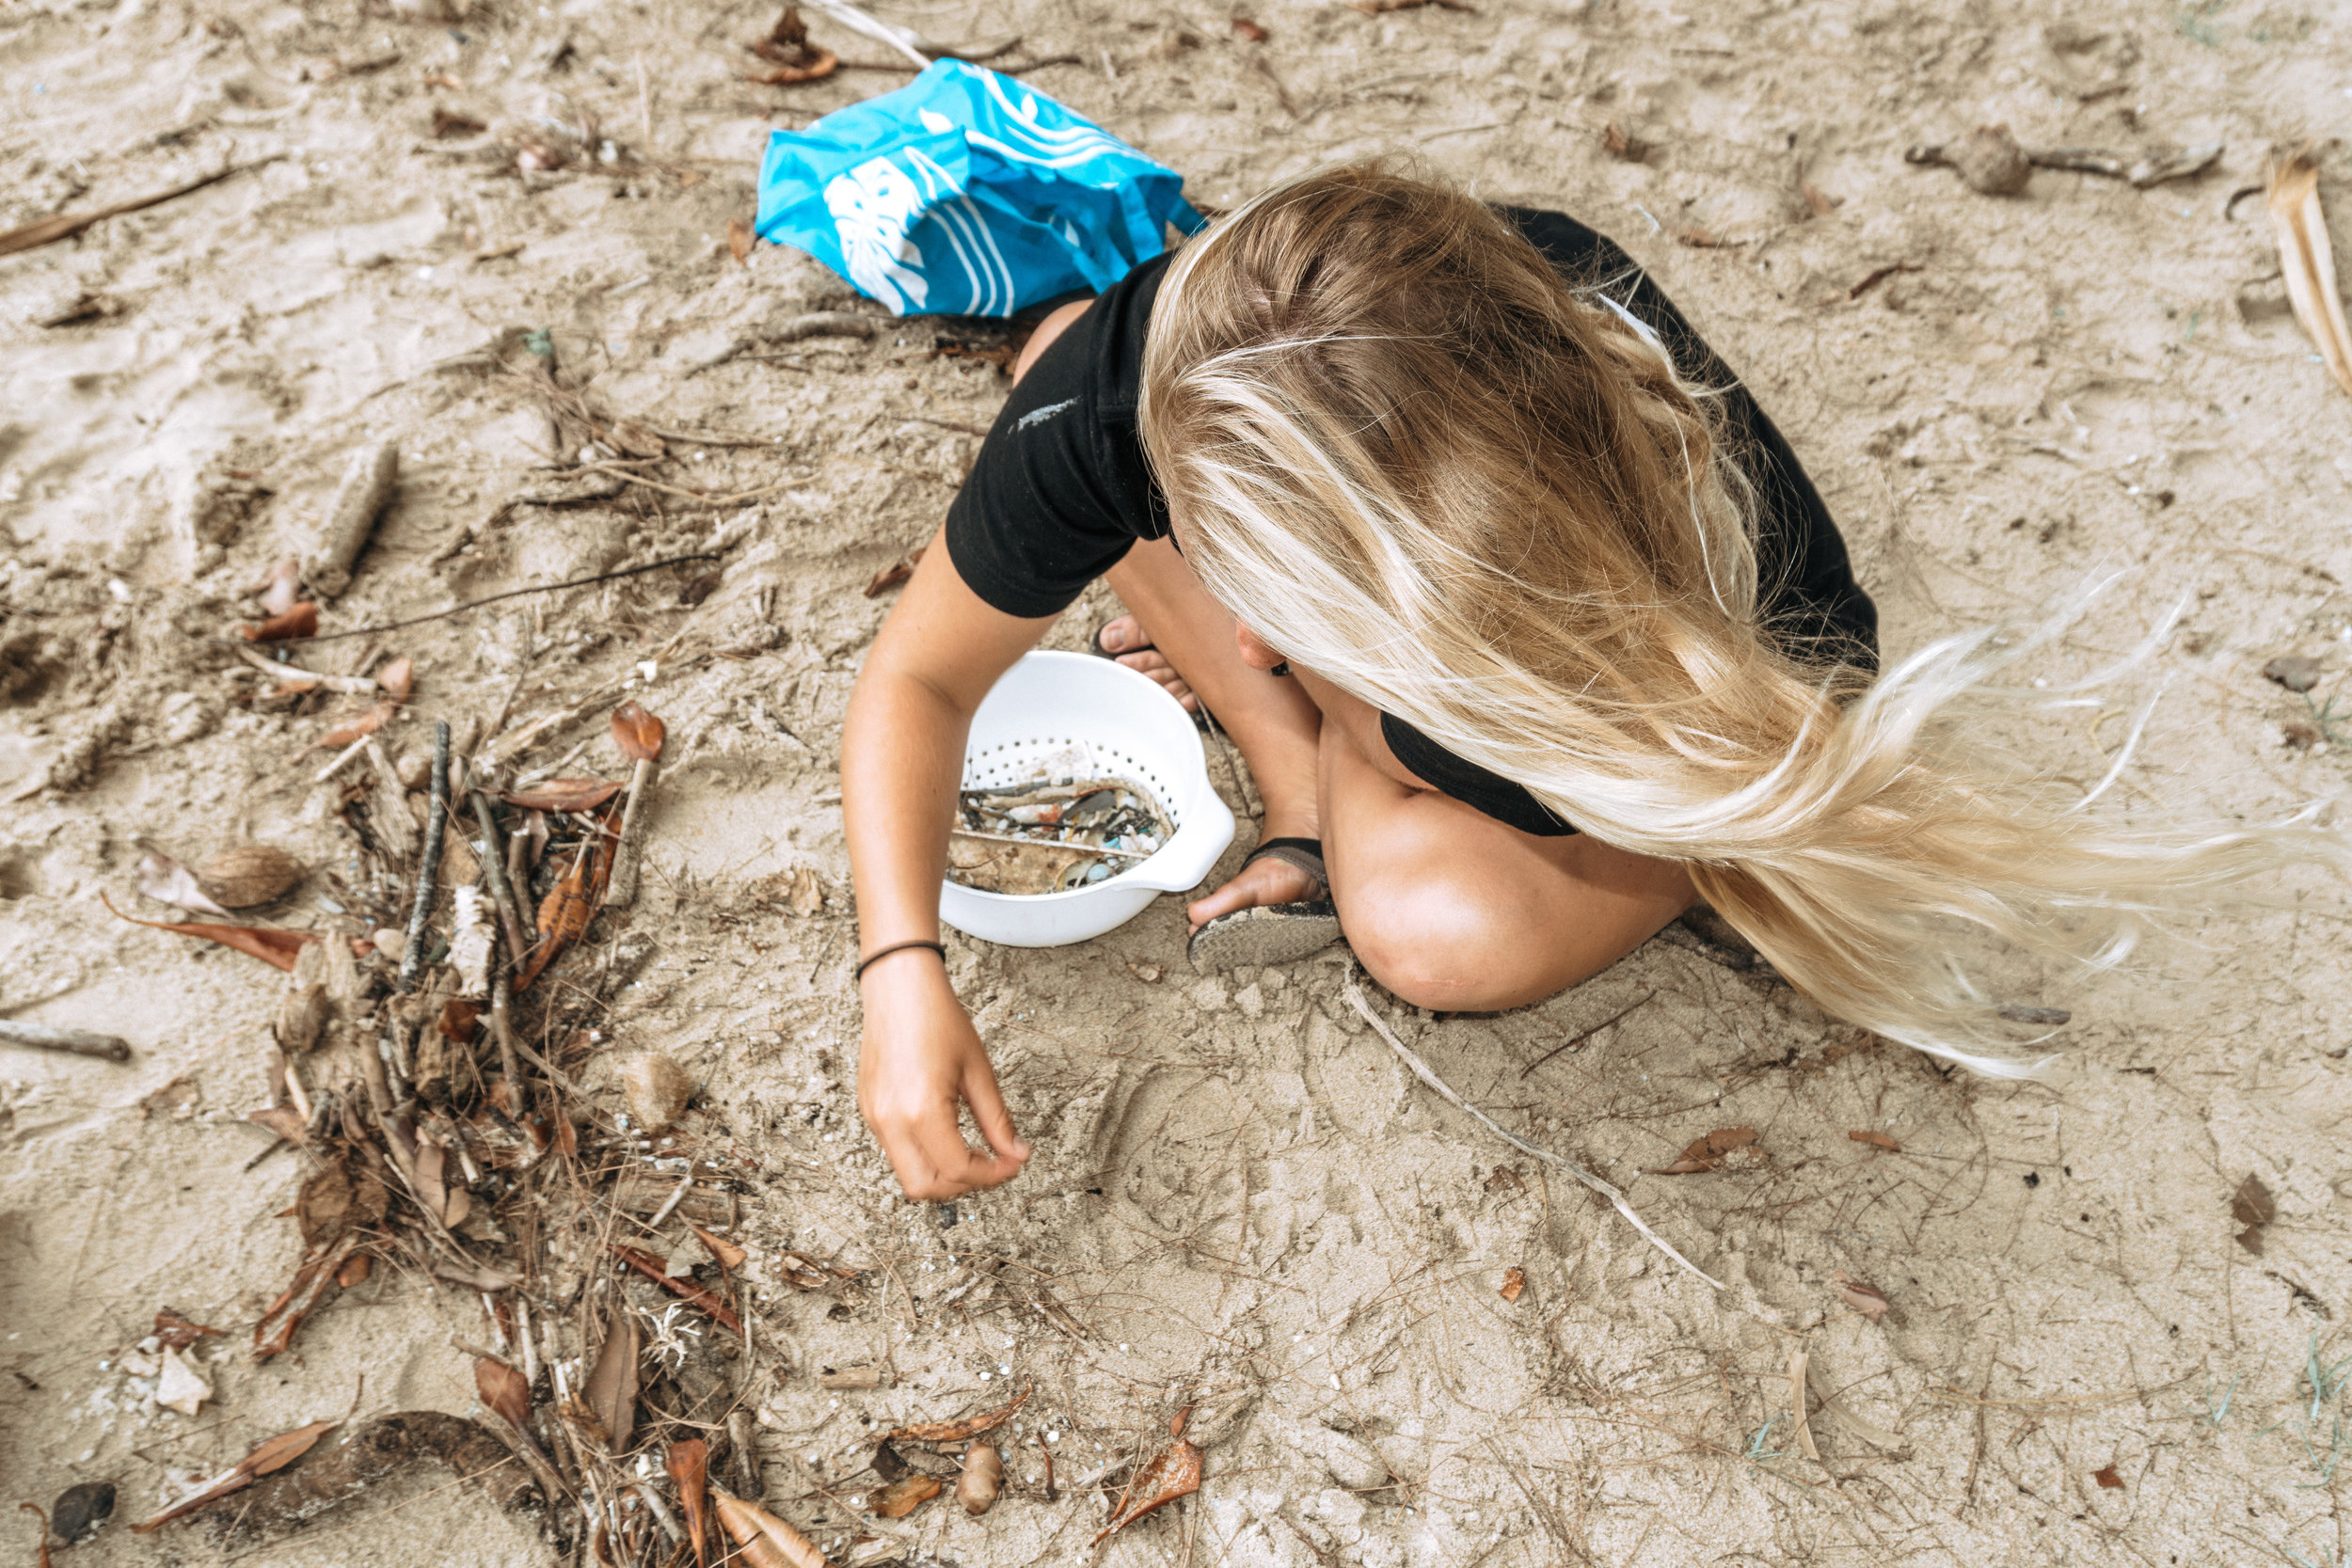 Saturday, May 11th - Reef and Beach Cleanup - Kahala Beach Park 9am - 12pm